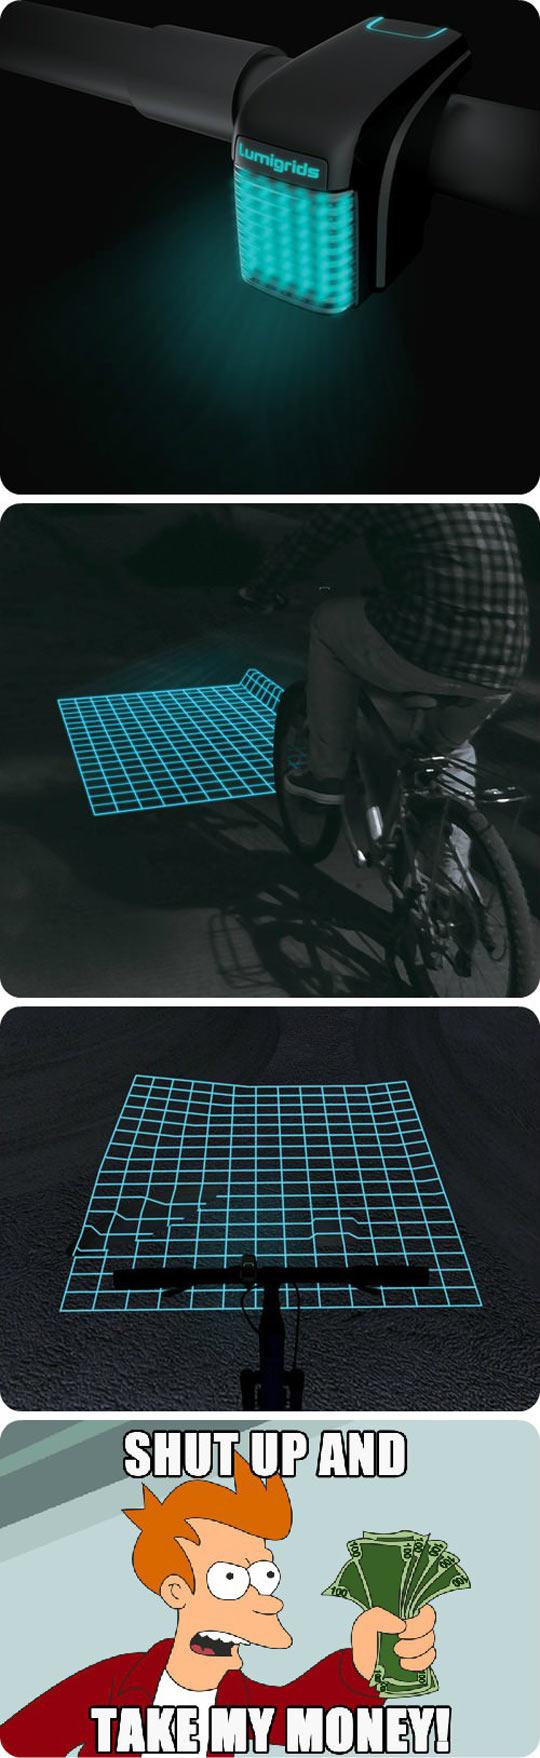 cool-bike-light-grid-night